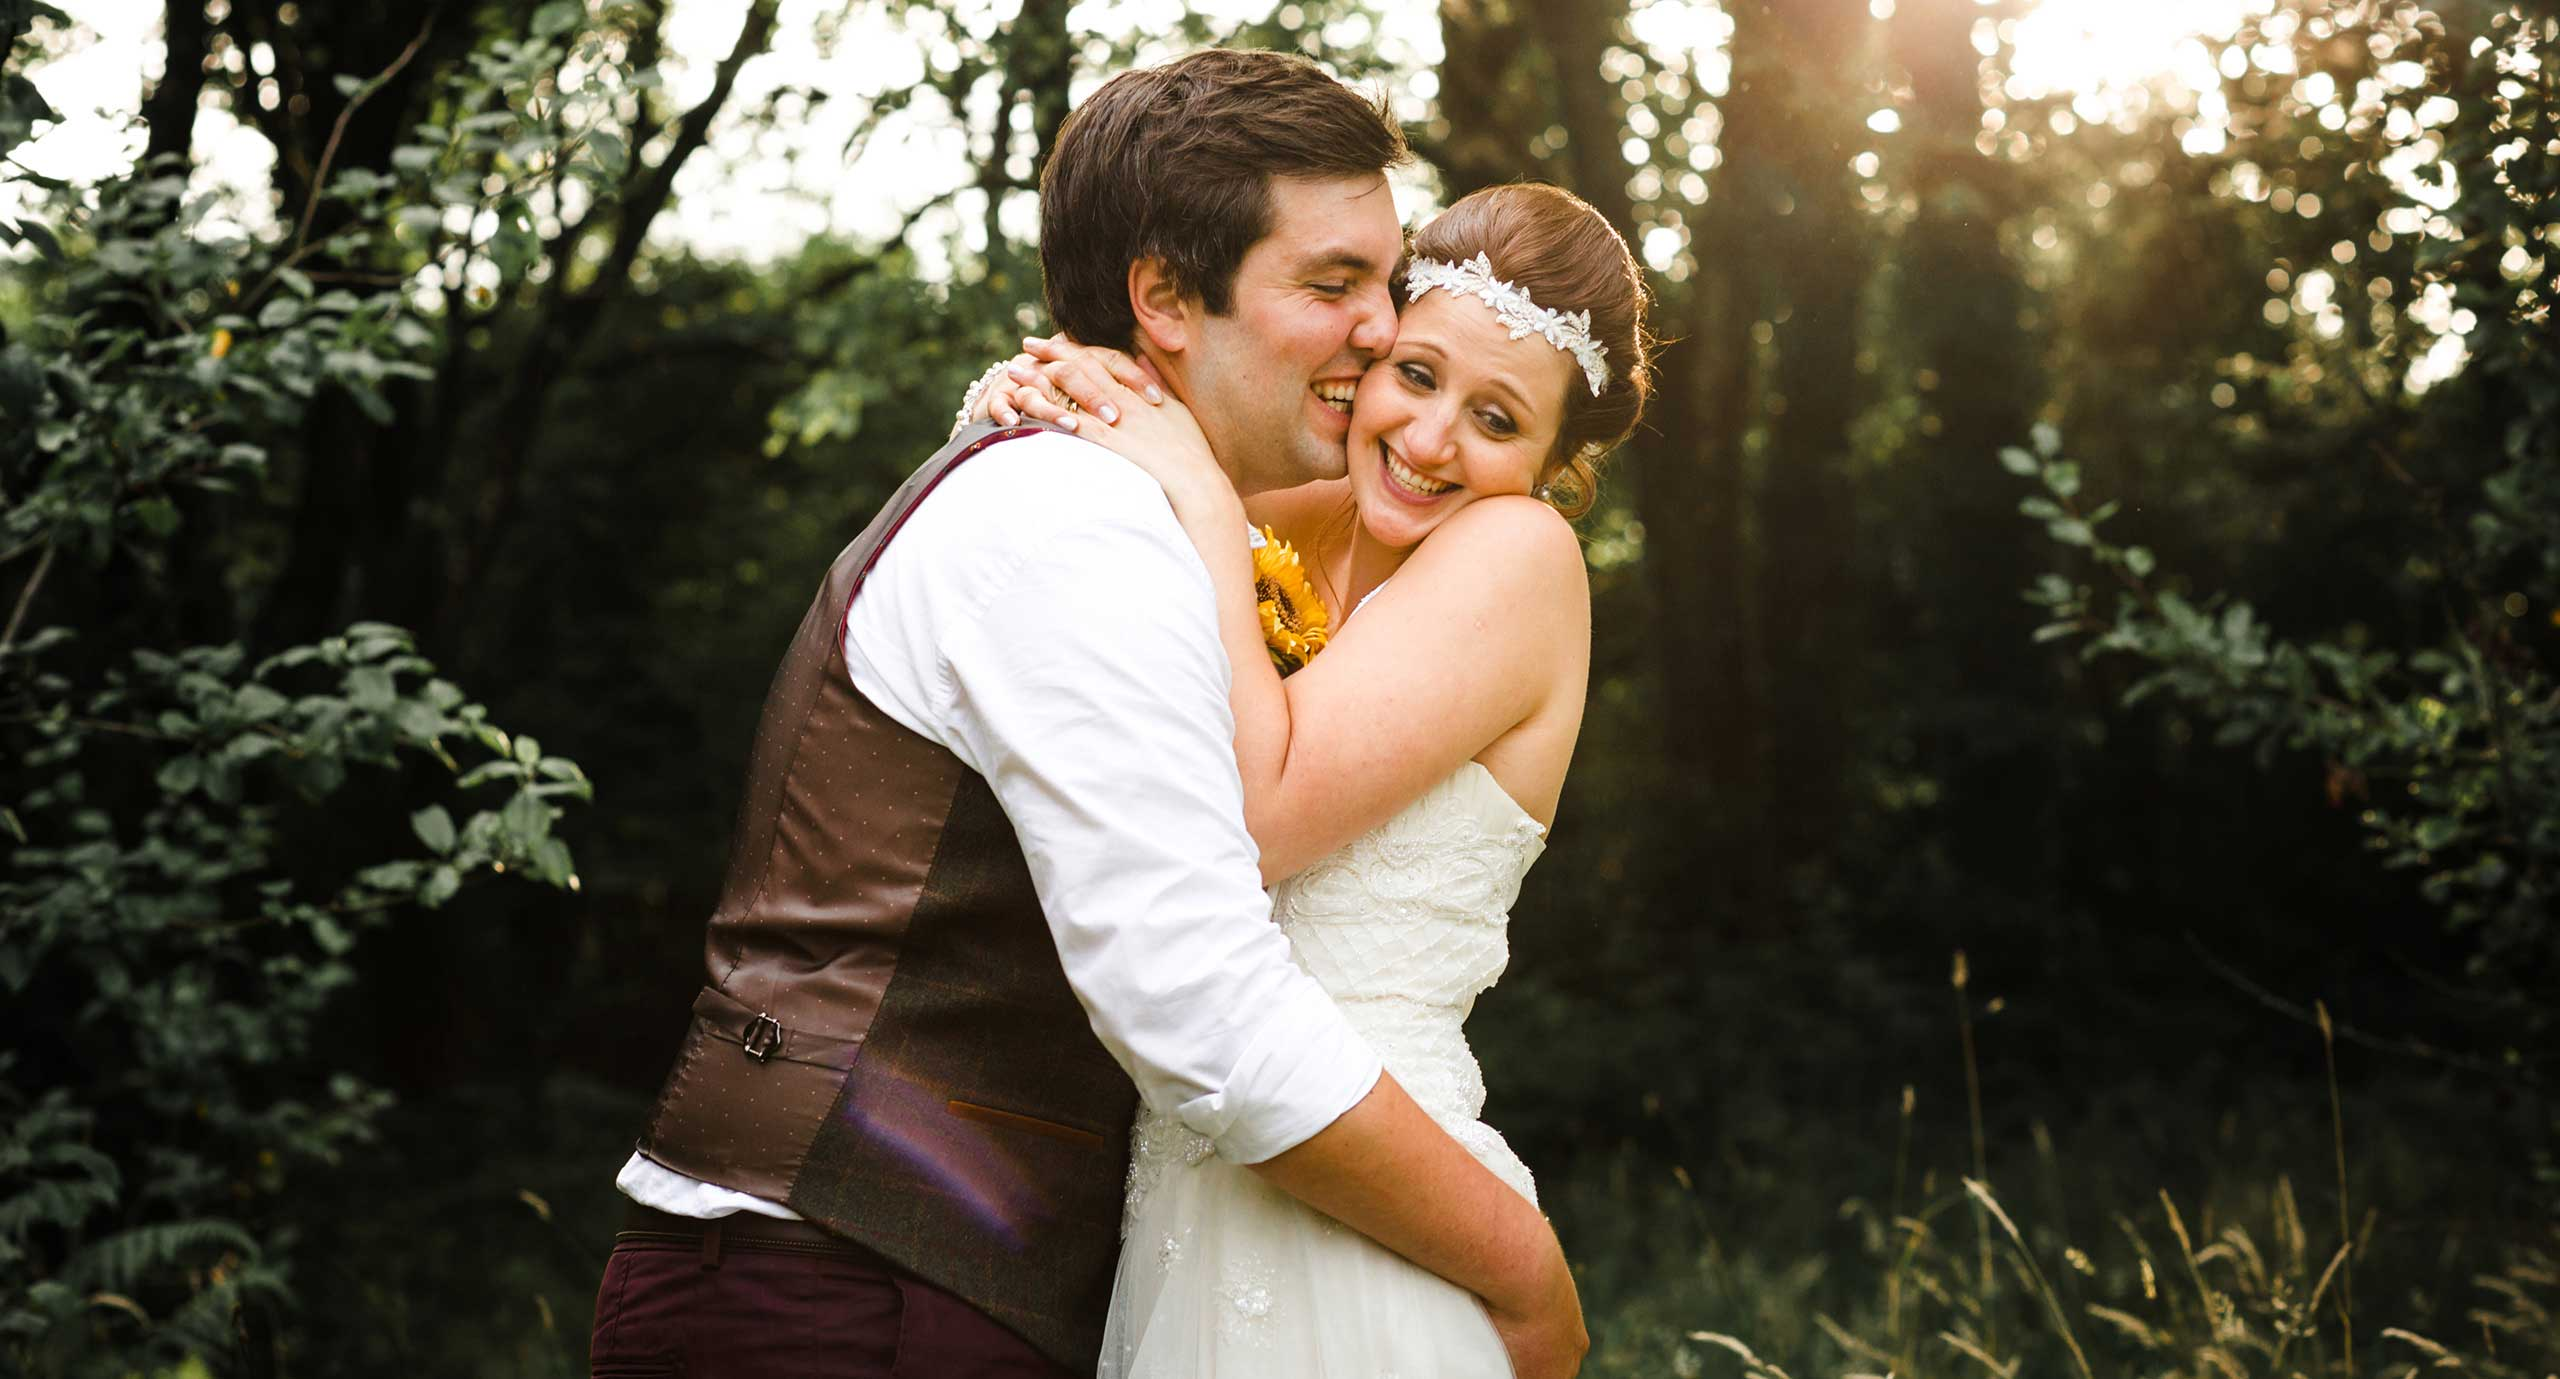 Bryngarw House wedding. Bride and Groom portrait at Bryngarw House in Bridgend